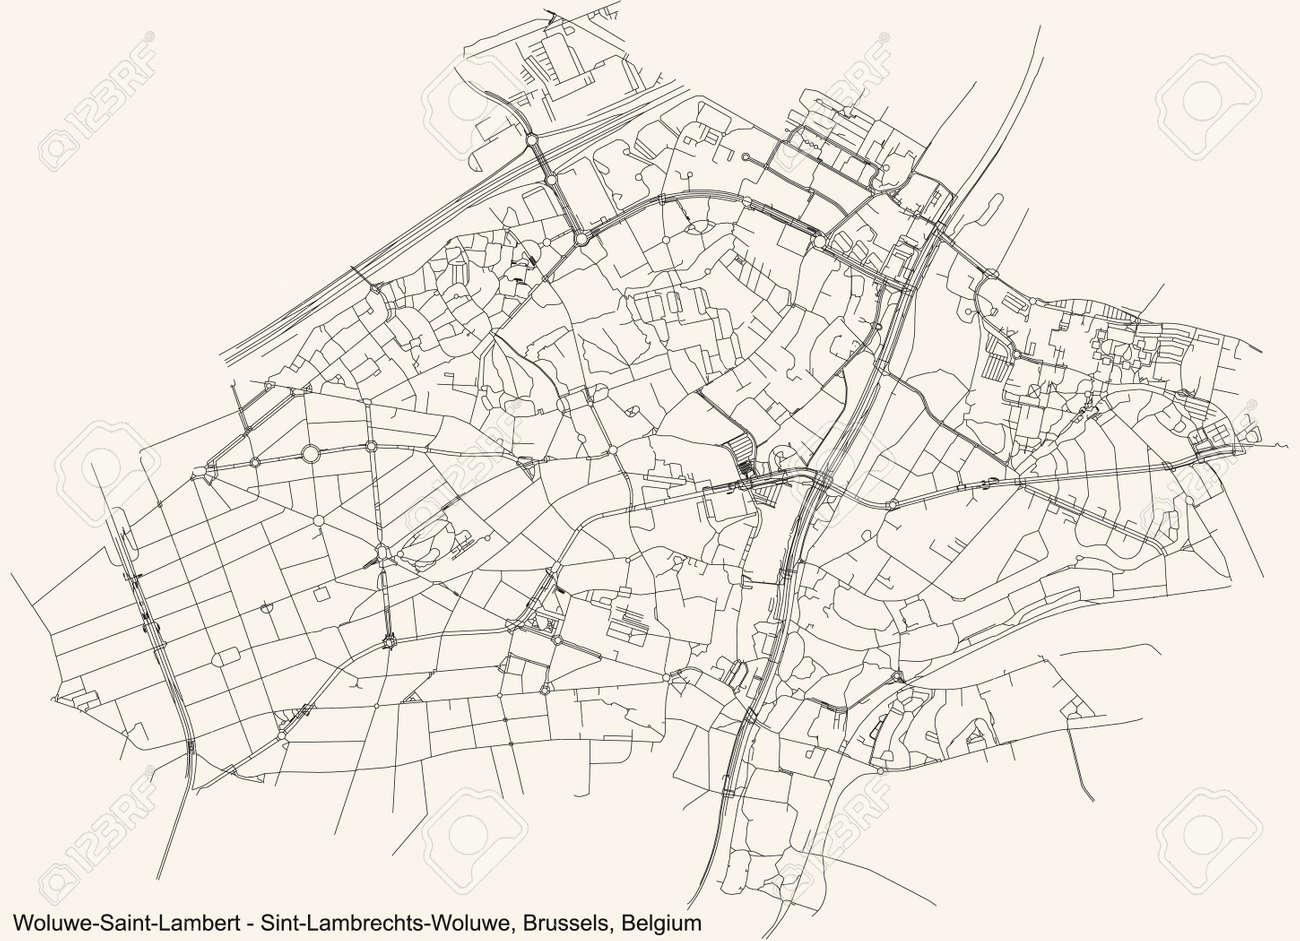 Black simple detailed street roads map on vintage beige background of the quarter Woluwe-Saint-Lambert (Sint-Lambrechts-Woluwe) municipality of Brussels, Belgium - 166353438